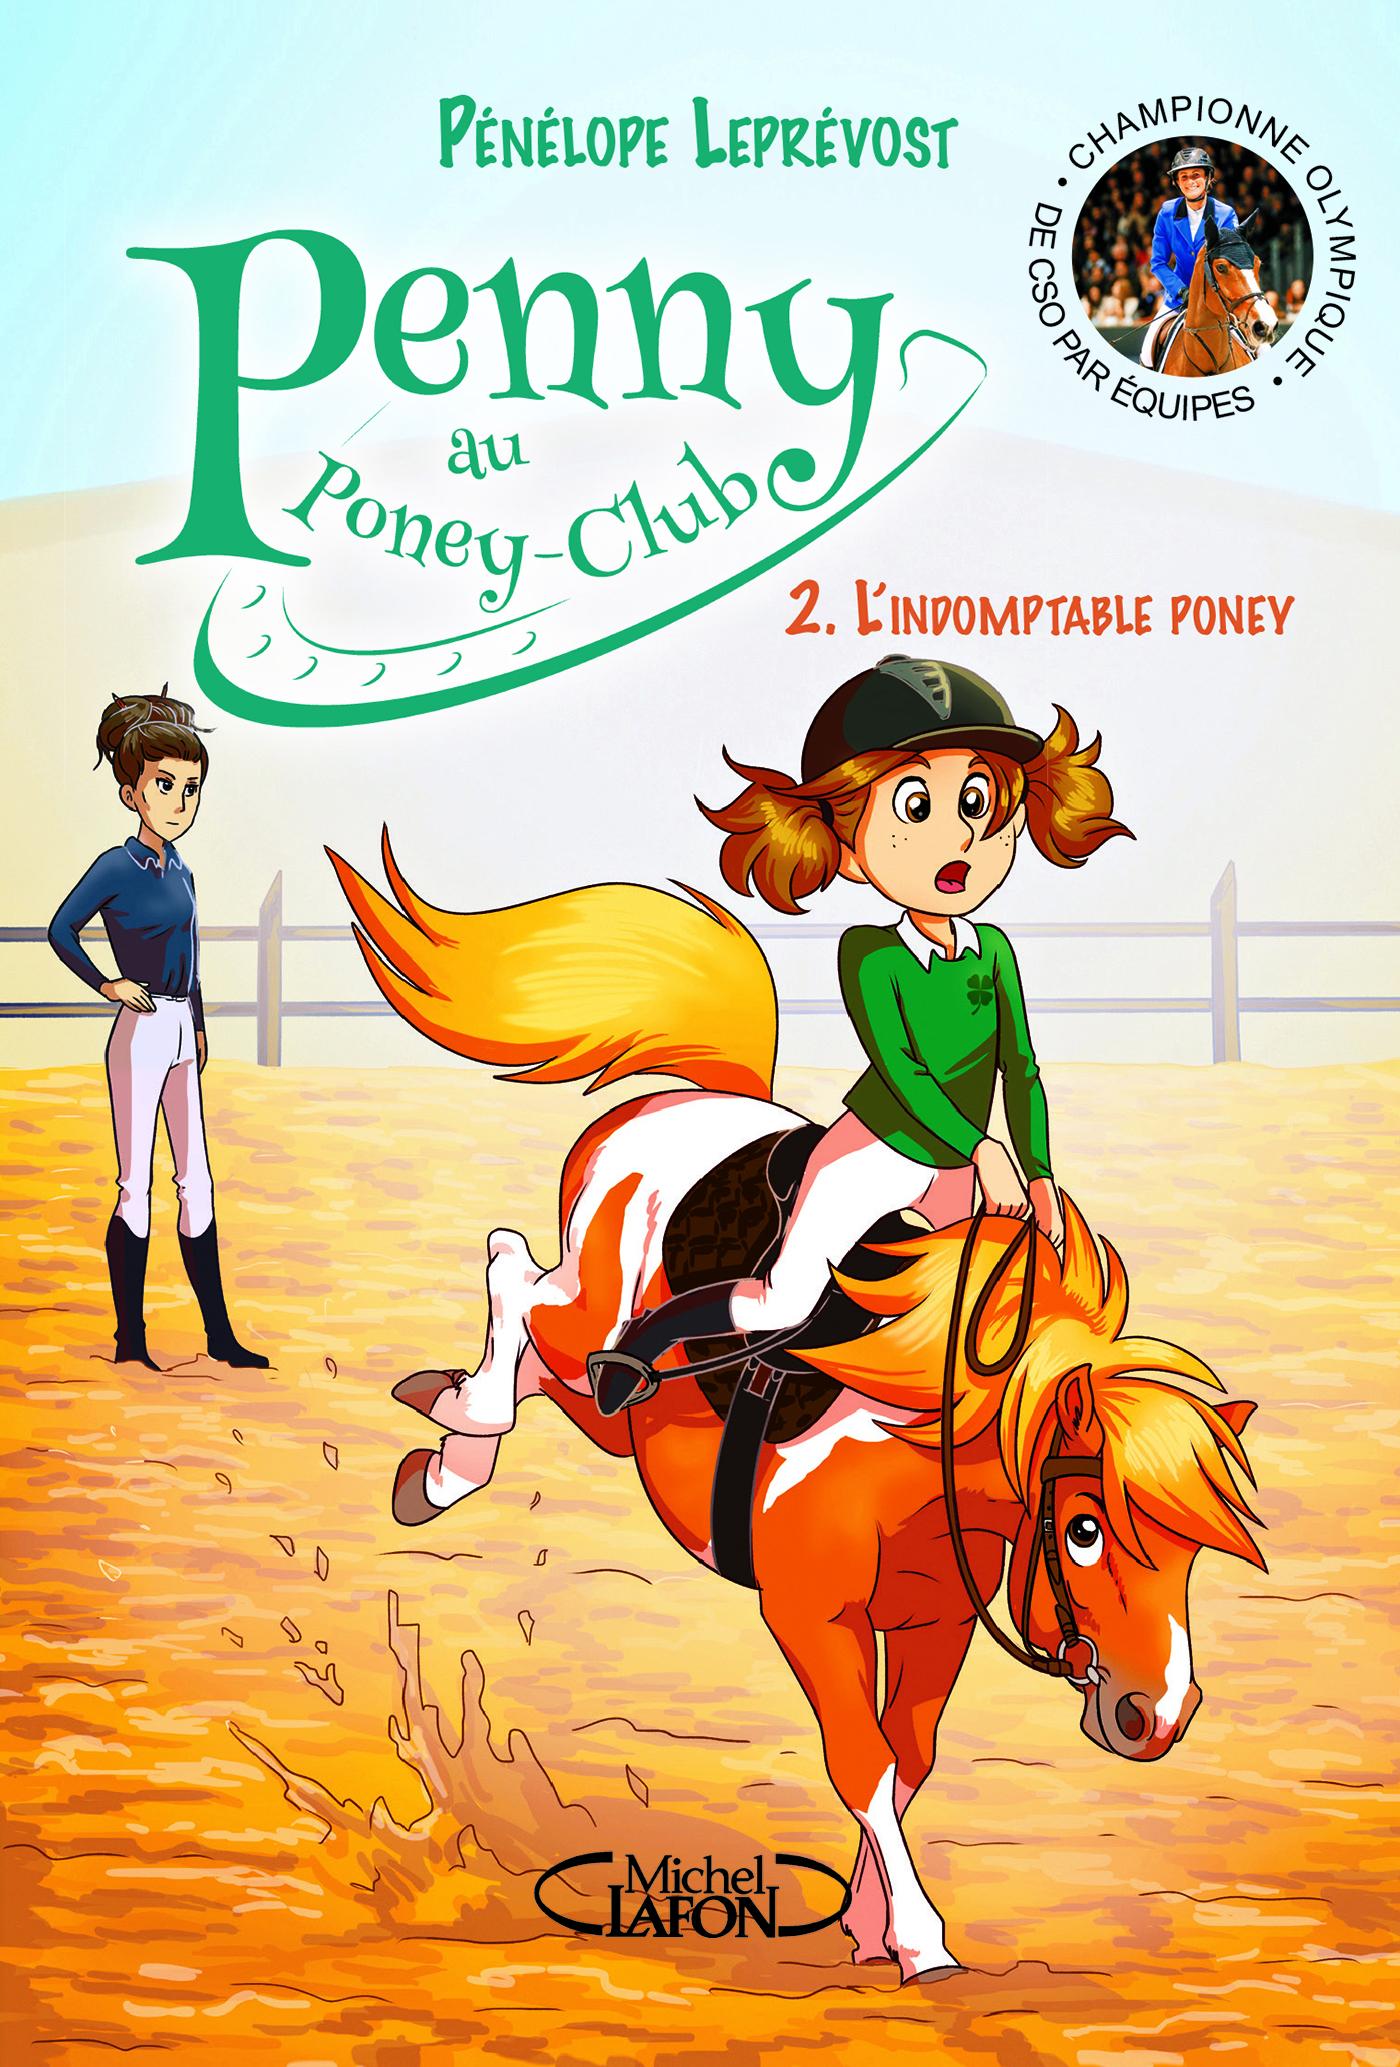 Penny au poney club – Tome 2